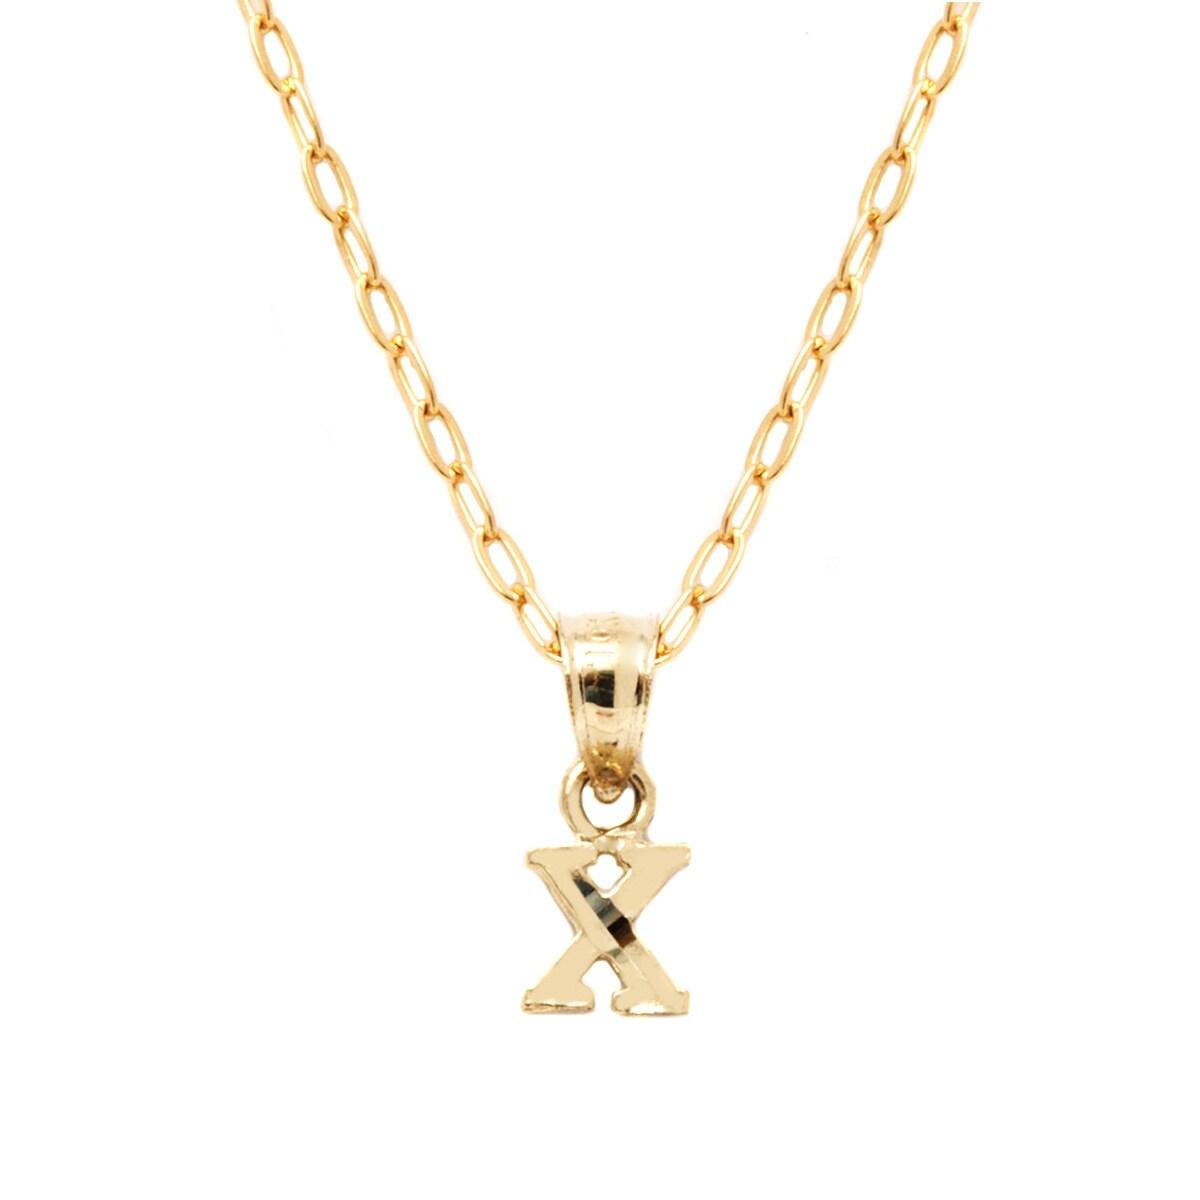 c85e664aa1460 Pori 10k Yellow Gold Diamond-cut Initial Pendant Necklace